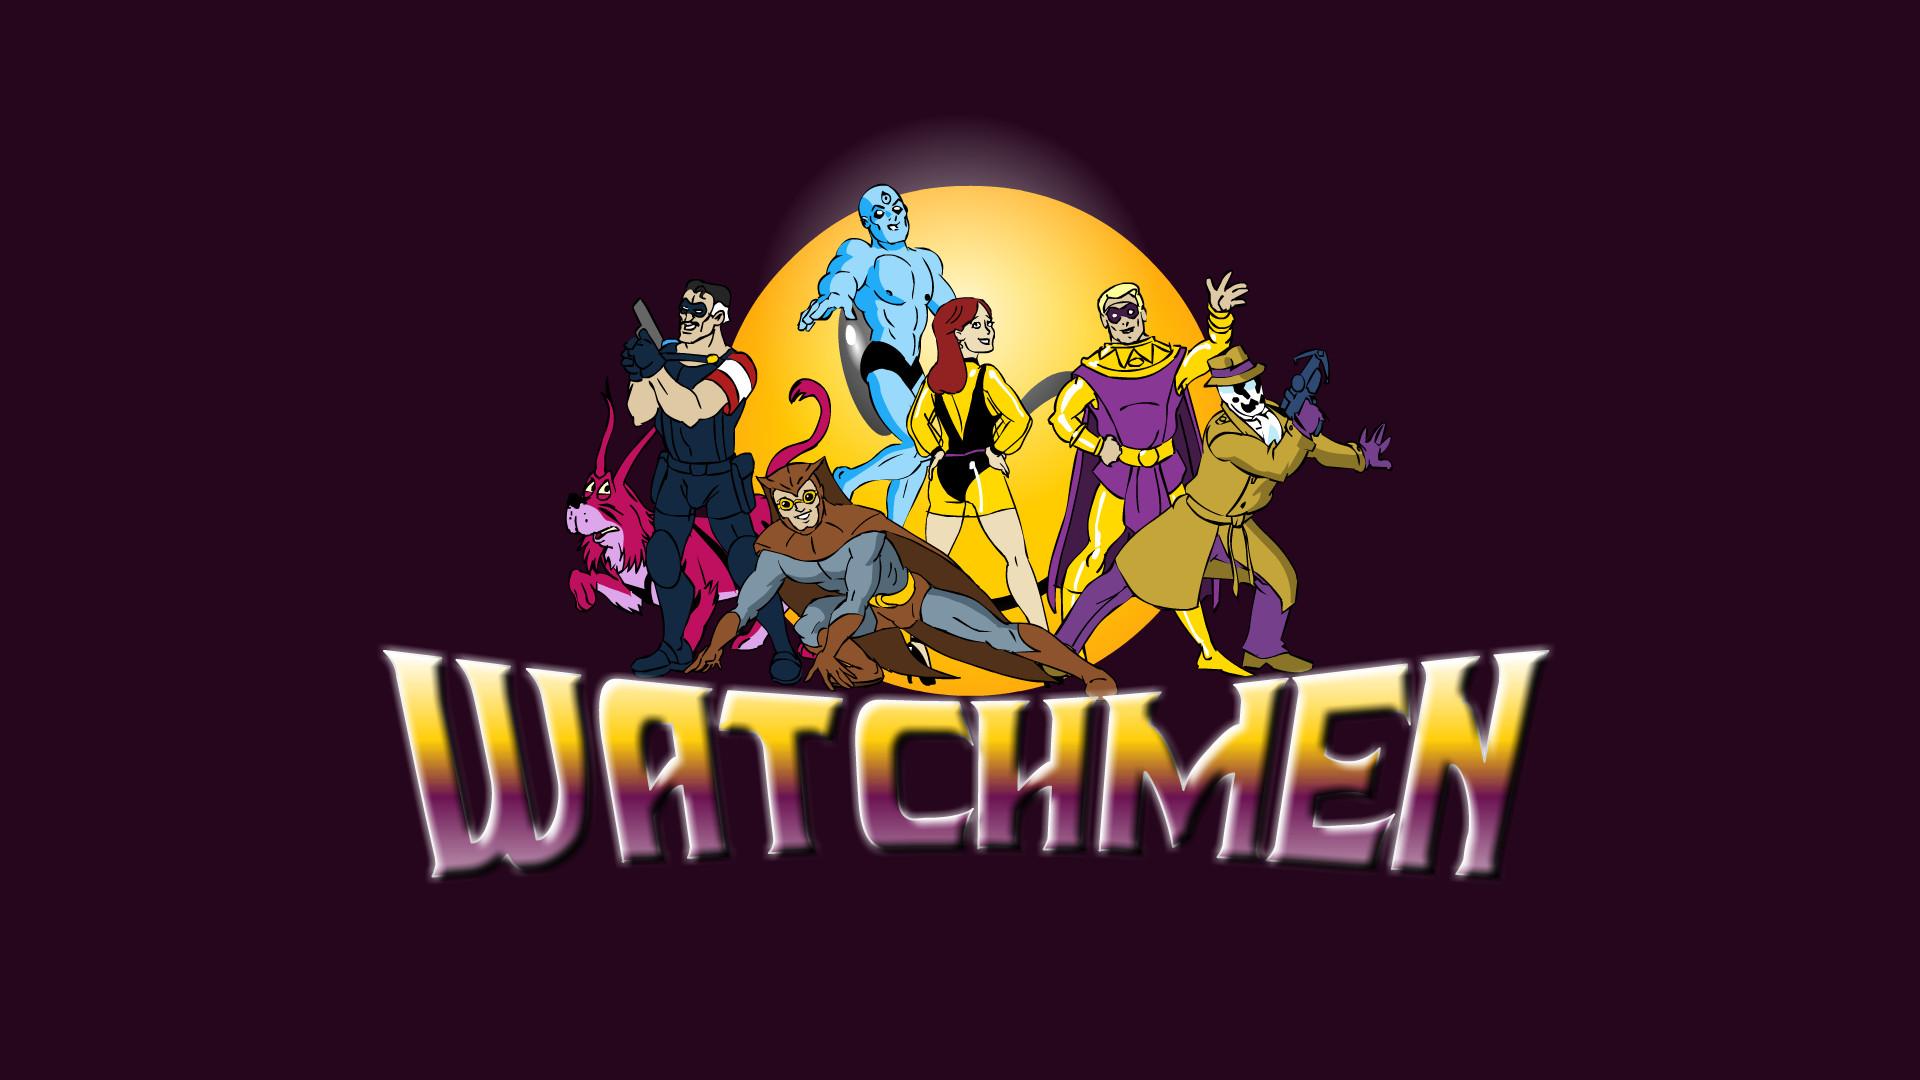 Amazing 39467819 Watchmen Wallpapers | px